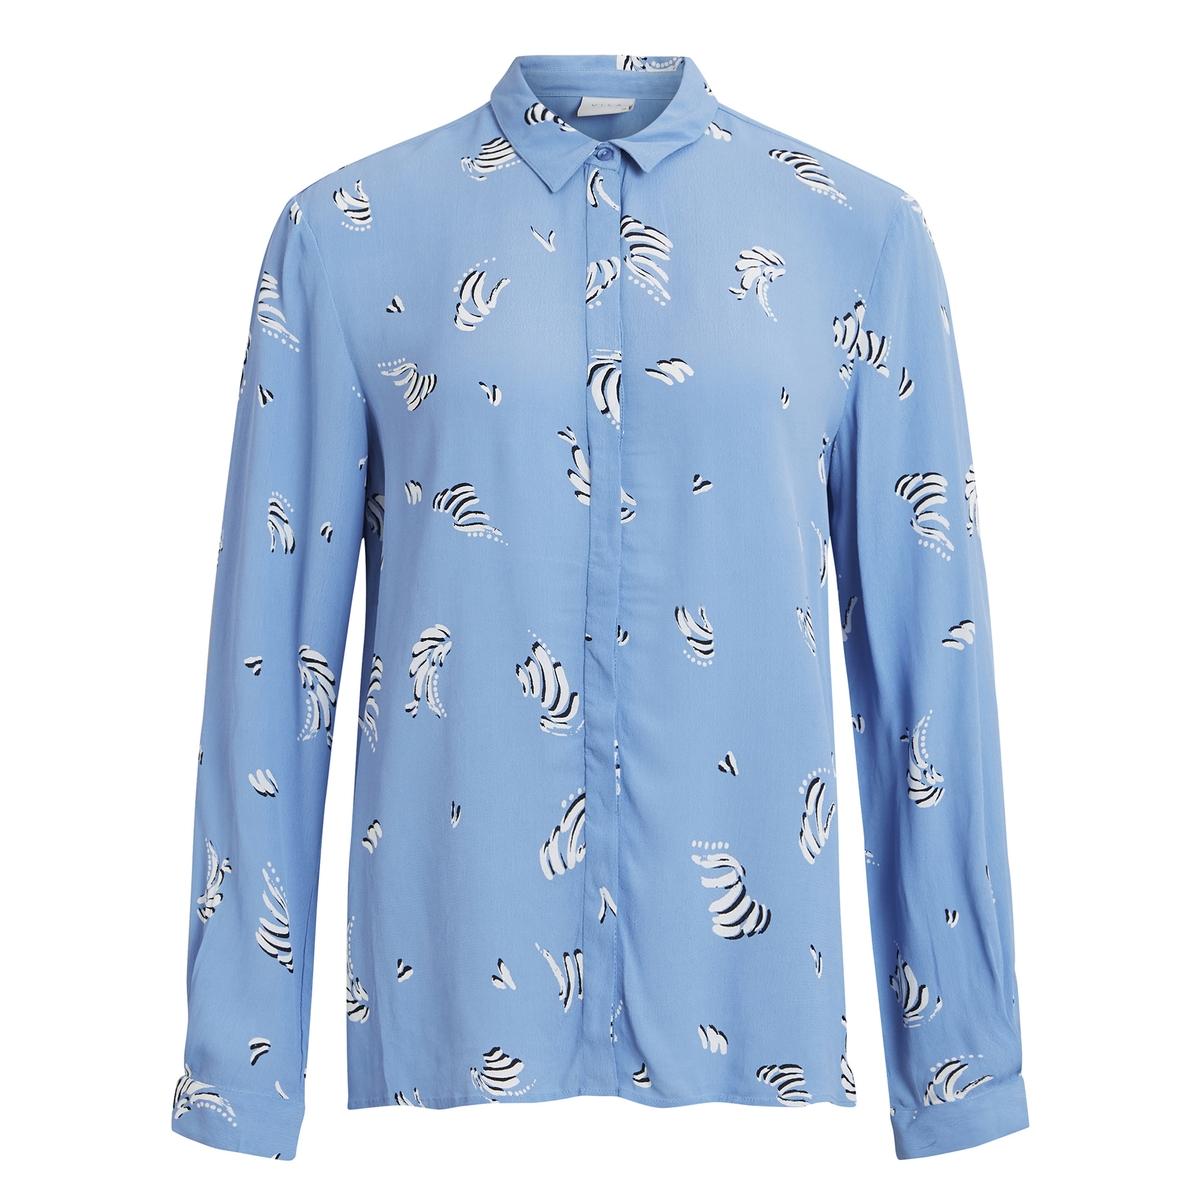 Рубашка La Redoute Струящаяся с рисунком 34 (FR) - 40 (RUS) синий бушлат la redoute с рисунком клетка 34 fr 40 rus синий